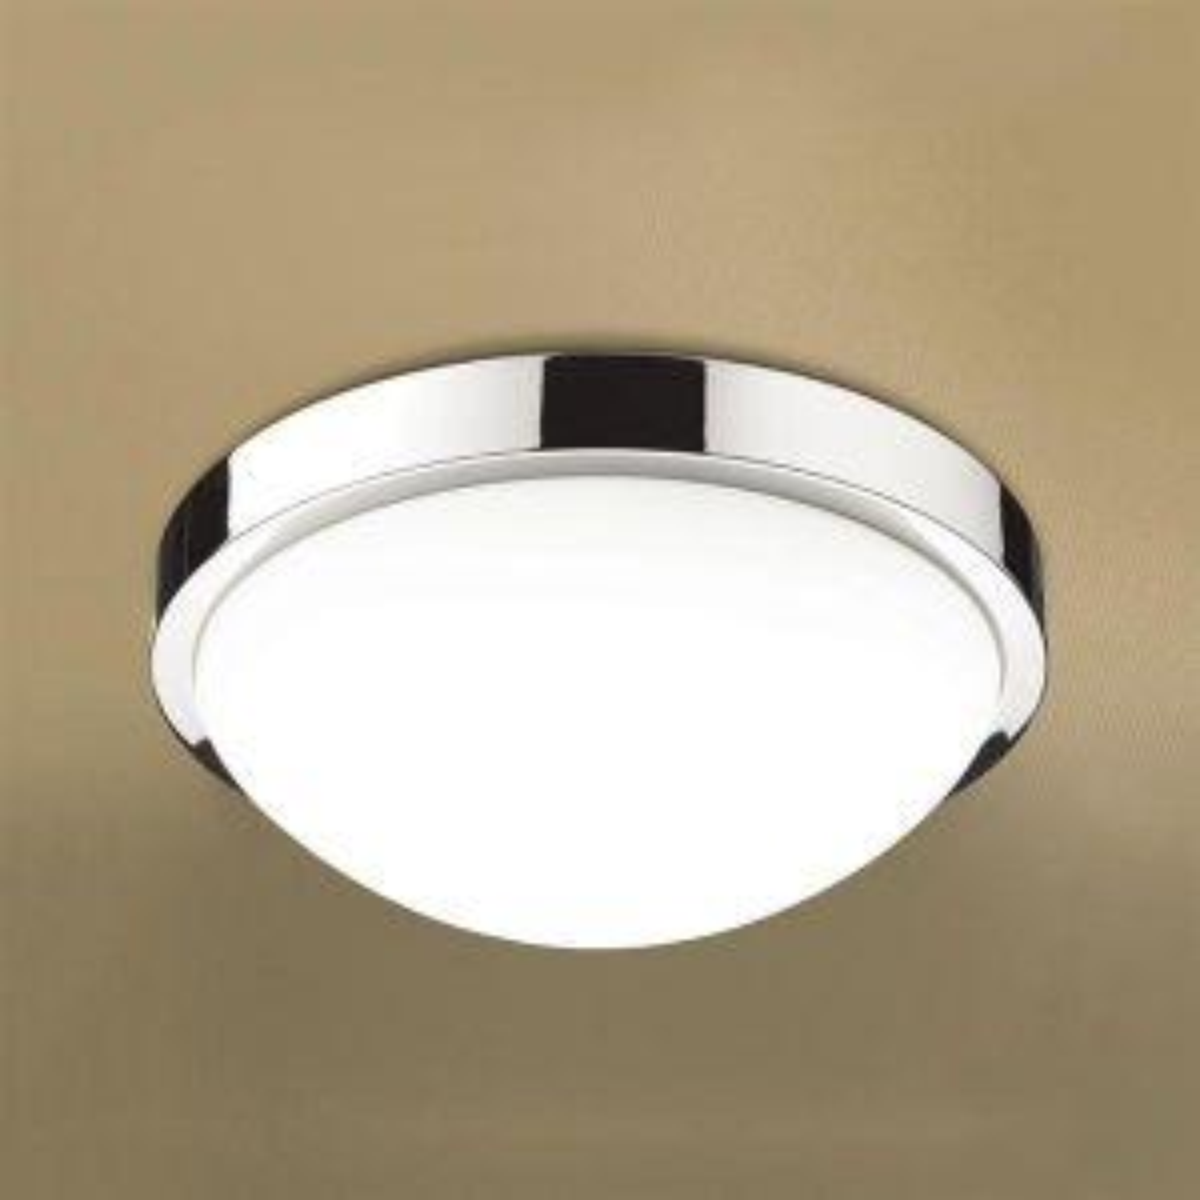 HiB Momentum Round LED Ceiling Light